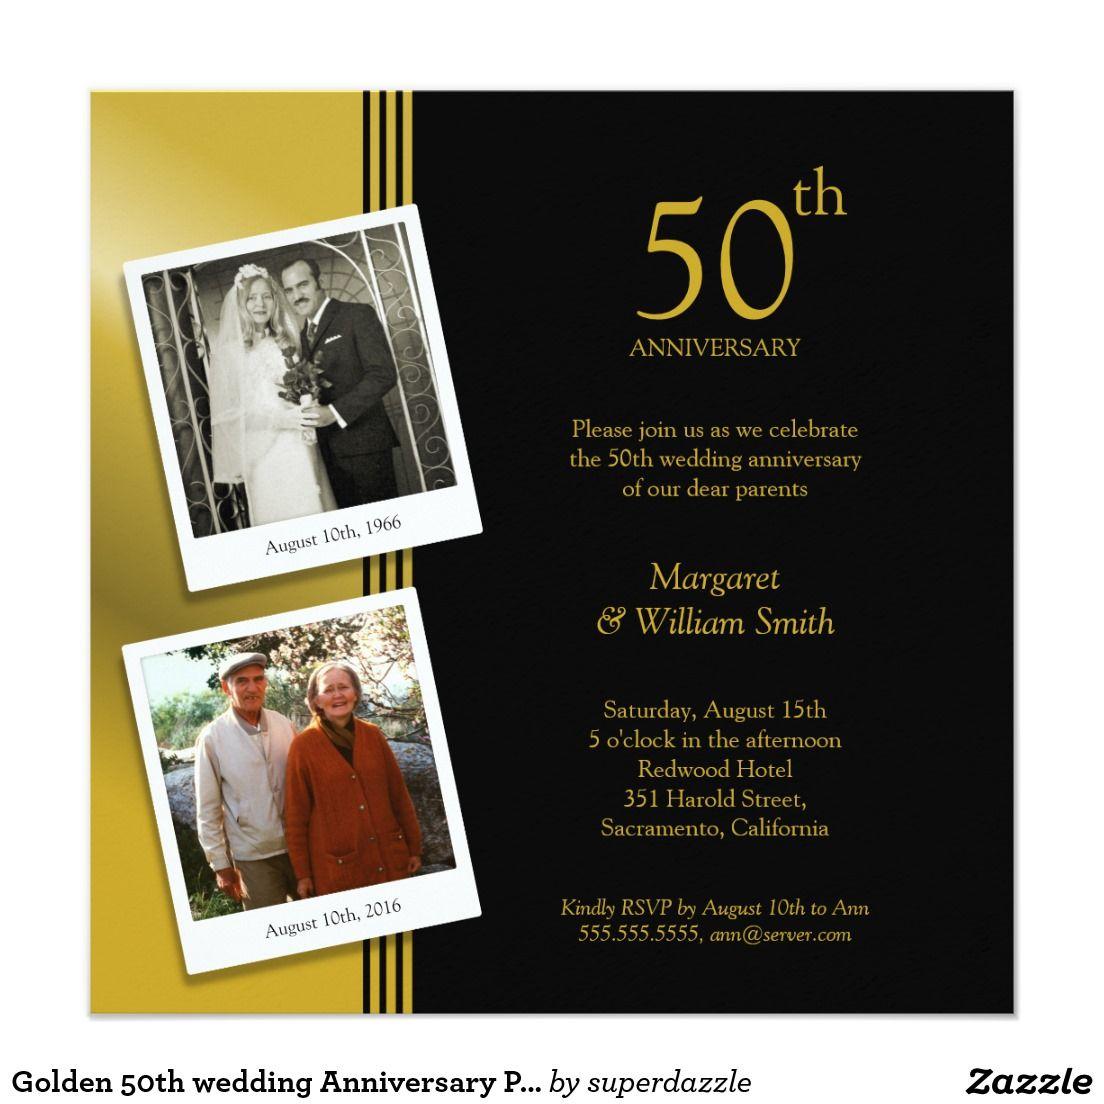 invitations wedding renewal vows ceremony%0A Golden   th wedding Anniversary Party Invitation Plus   Photos Card   Elegant customized invitation template